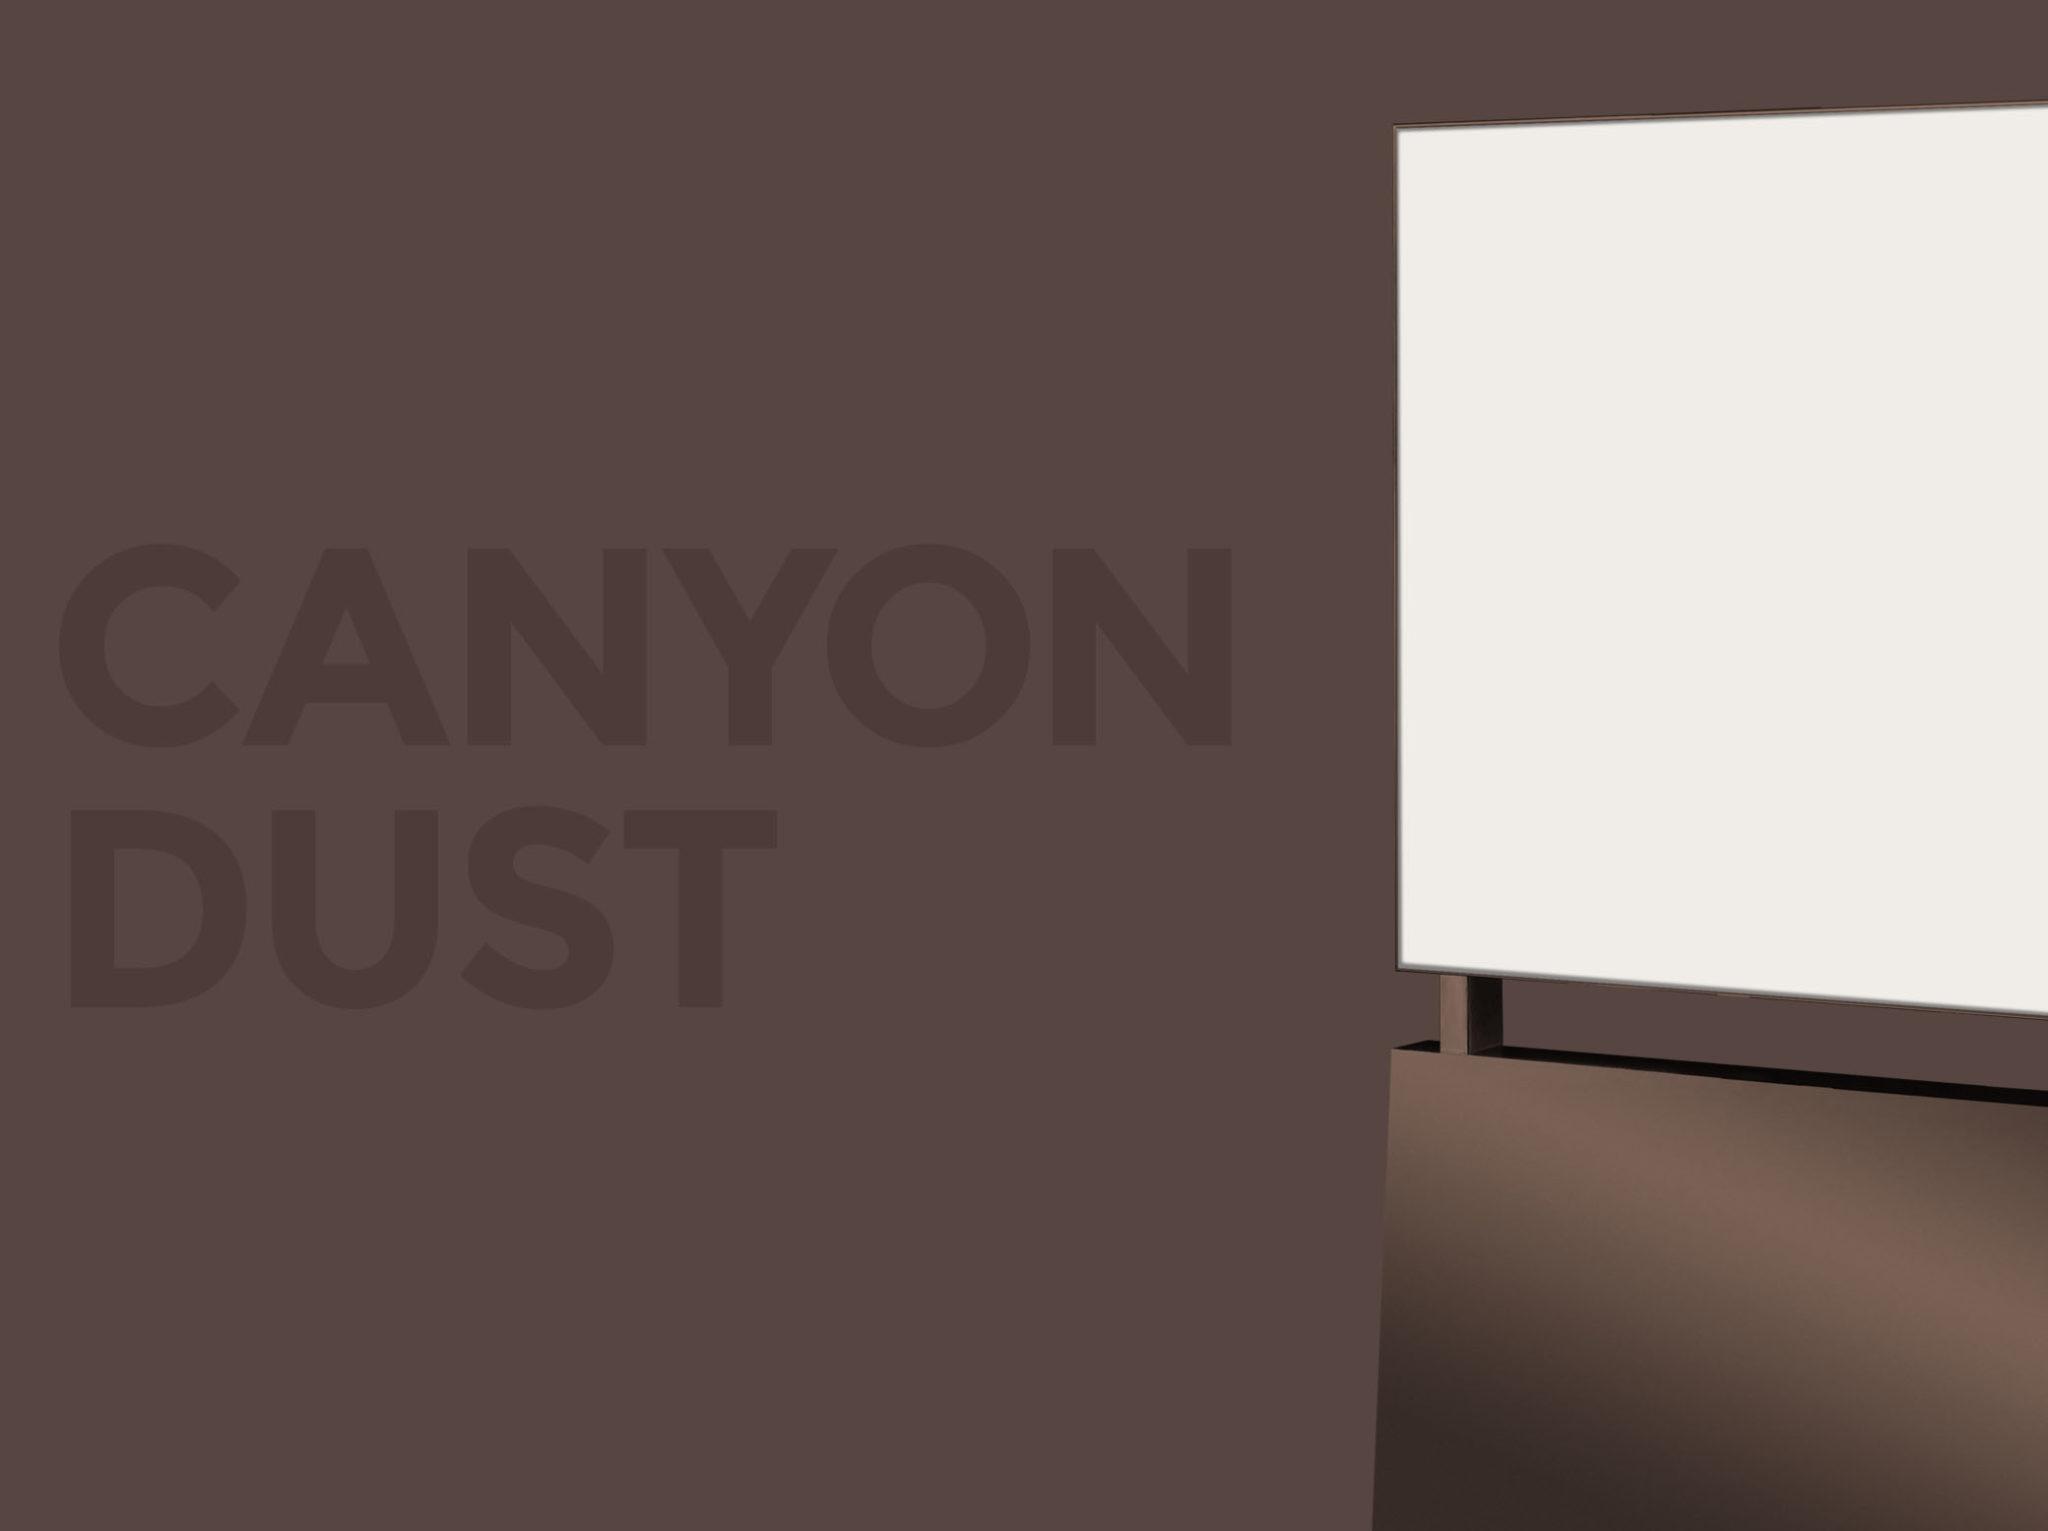 classic-frame-colorsCanyon